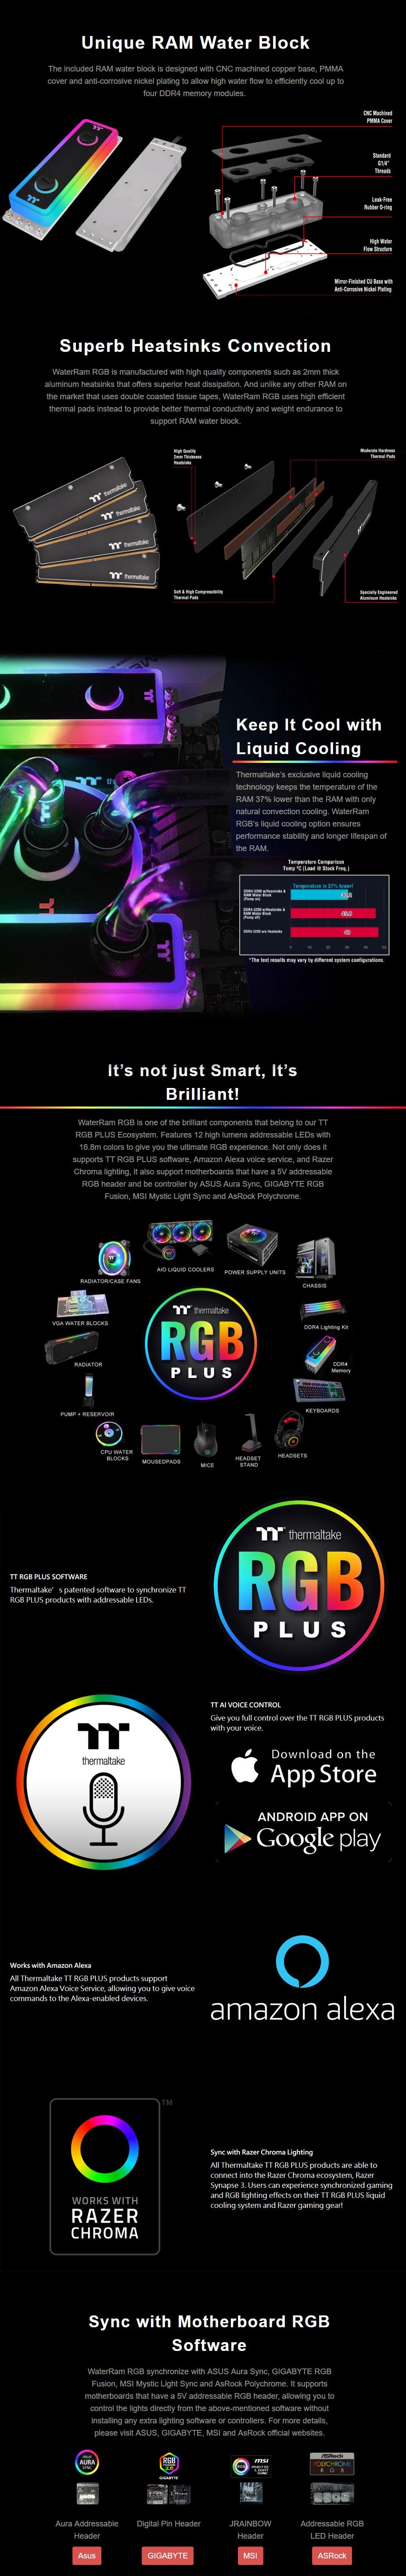 Thermaltake WaterRam 16GB (2x 8GB) 3200MHz DDR4 Liquid Cooled Memory - Desktop Overview 6